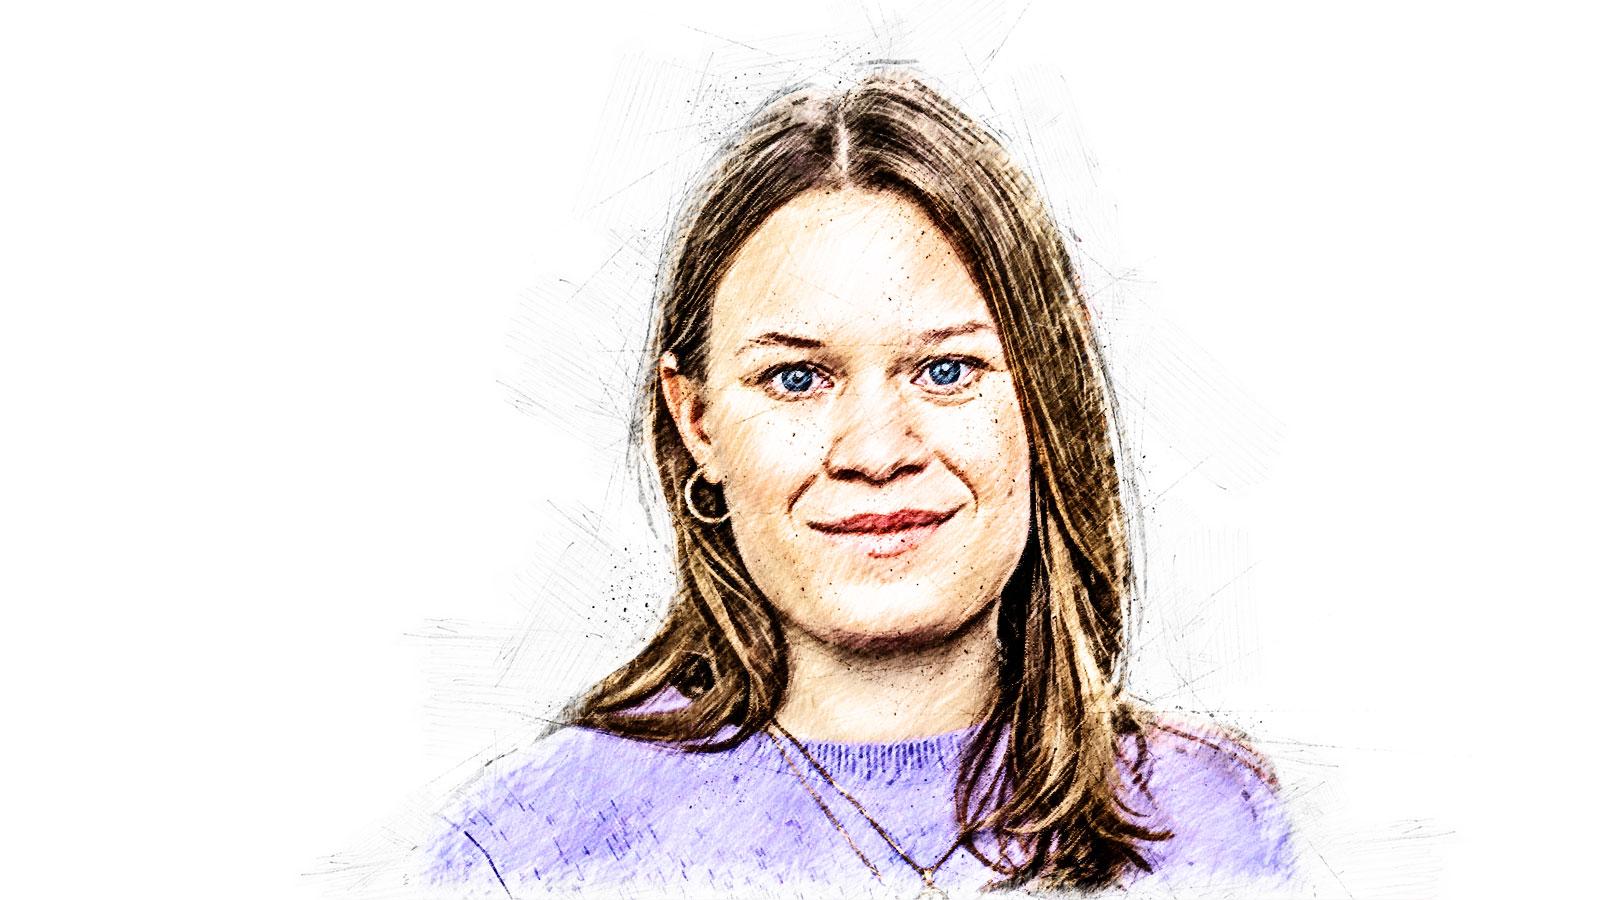 Magdalena Krieger, DIW, Wissenschaftler, Flüchtlinge, Integration, Rassimsus